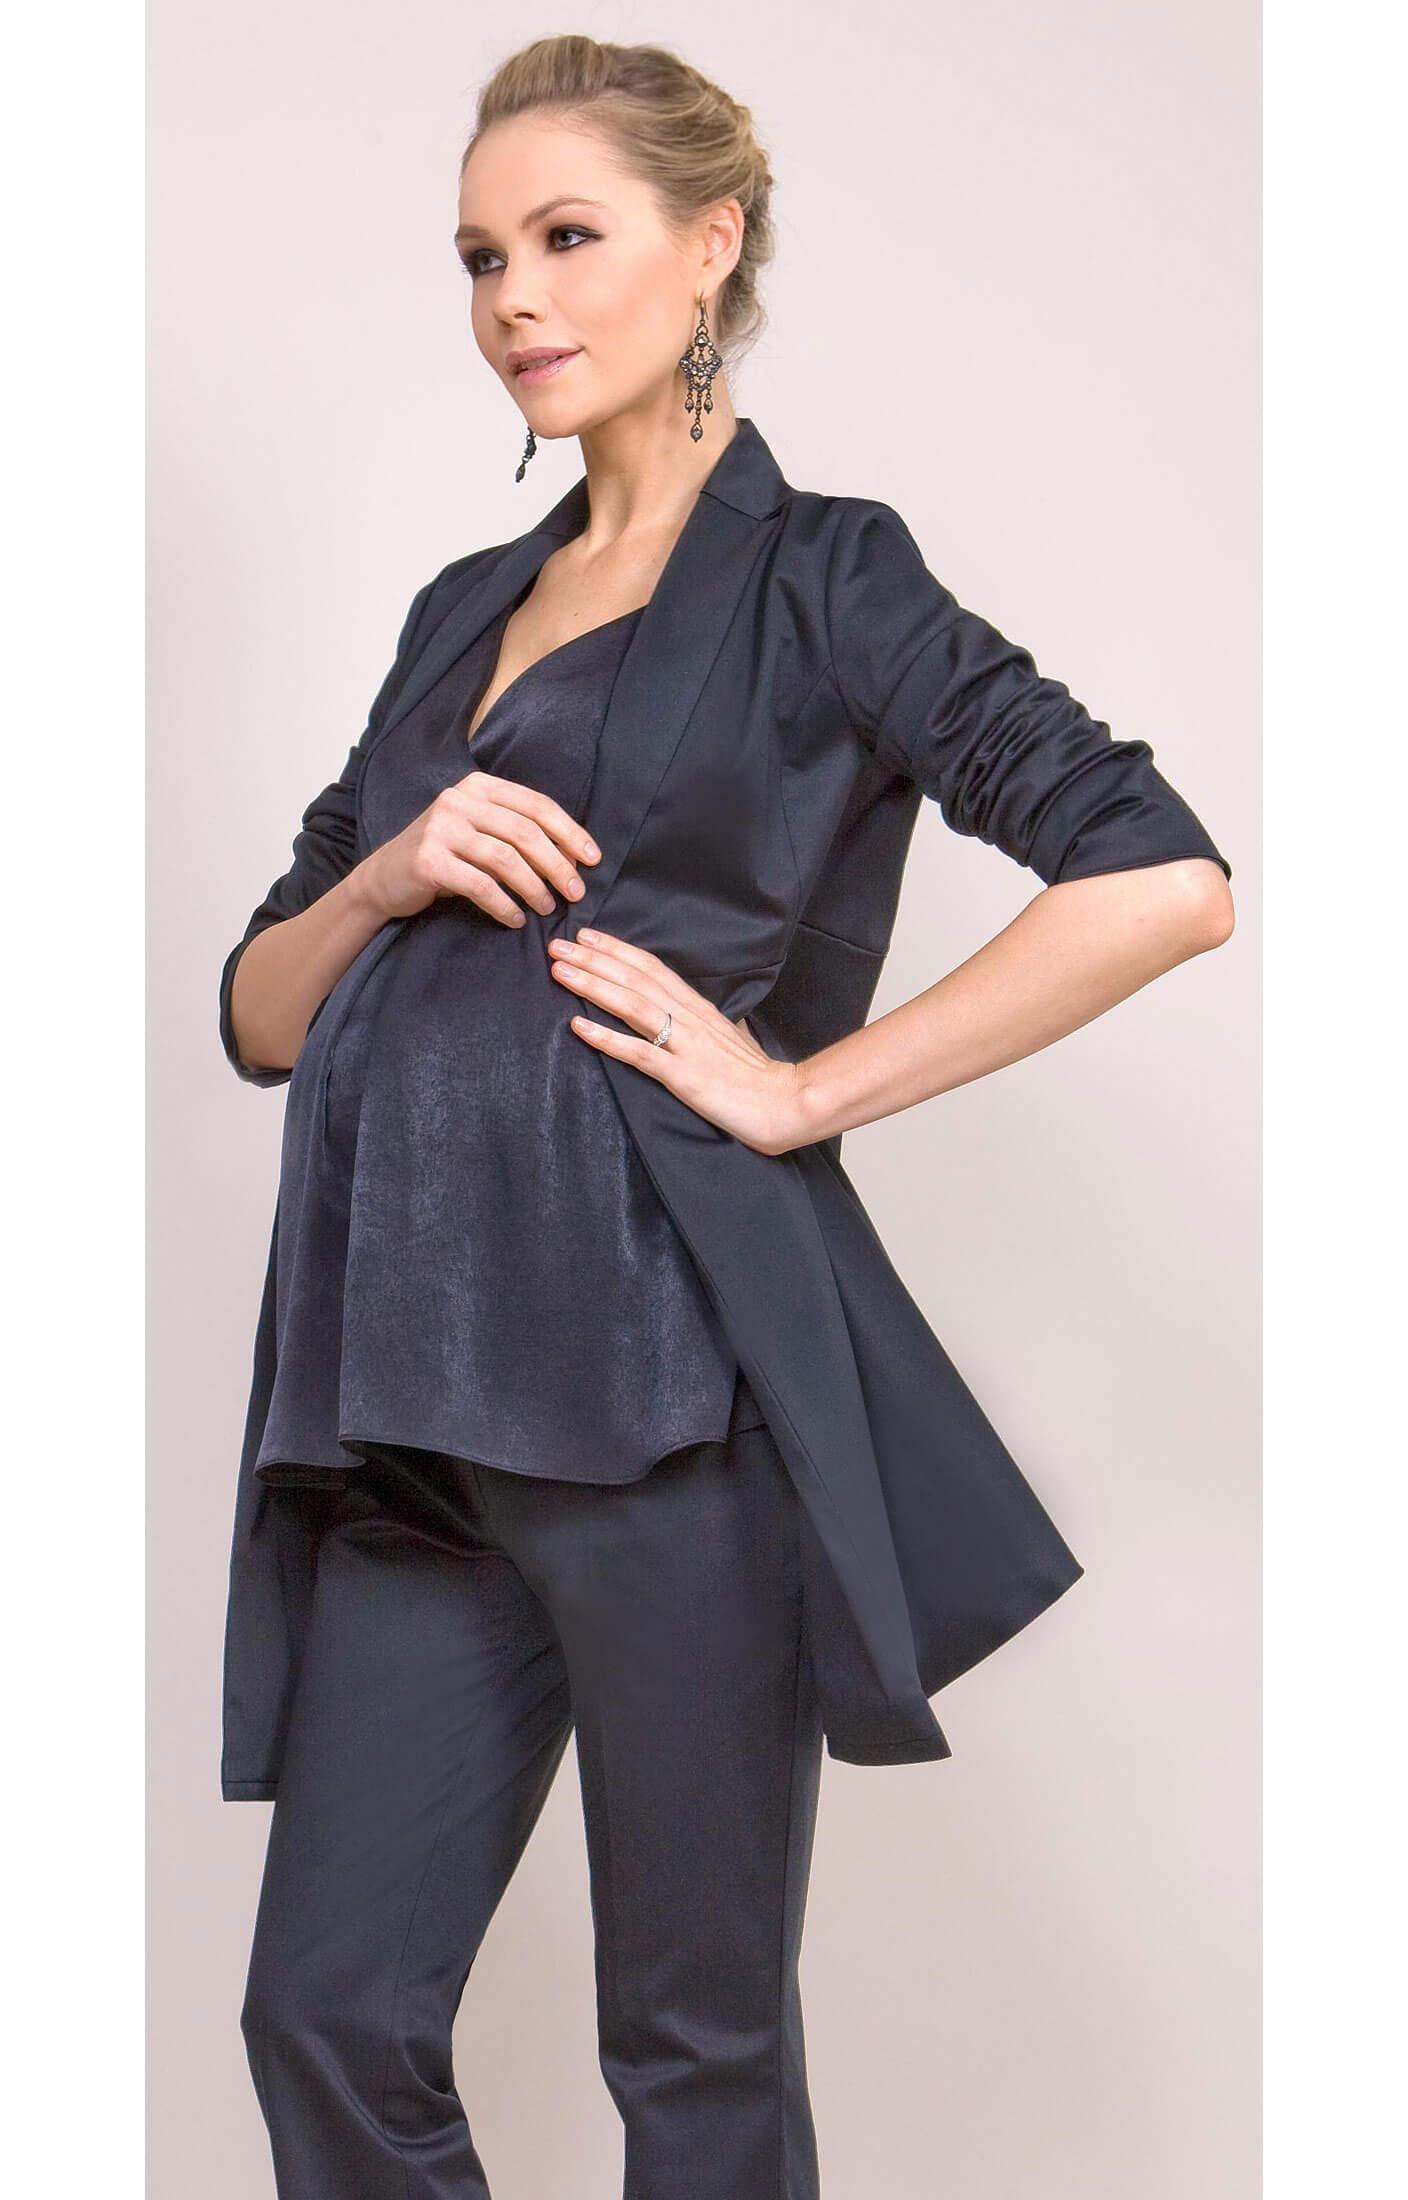 2bddee53c3201 Tailored Maternity Jacket (Black) - Maternity Wedding Dresses ...